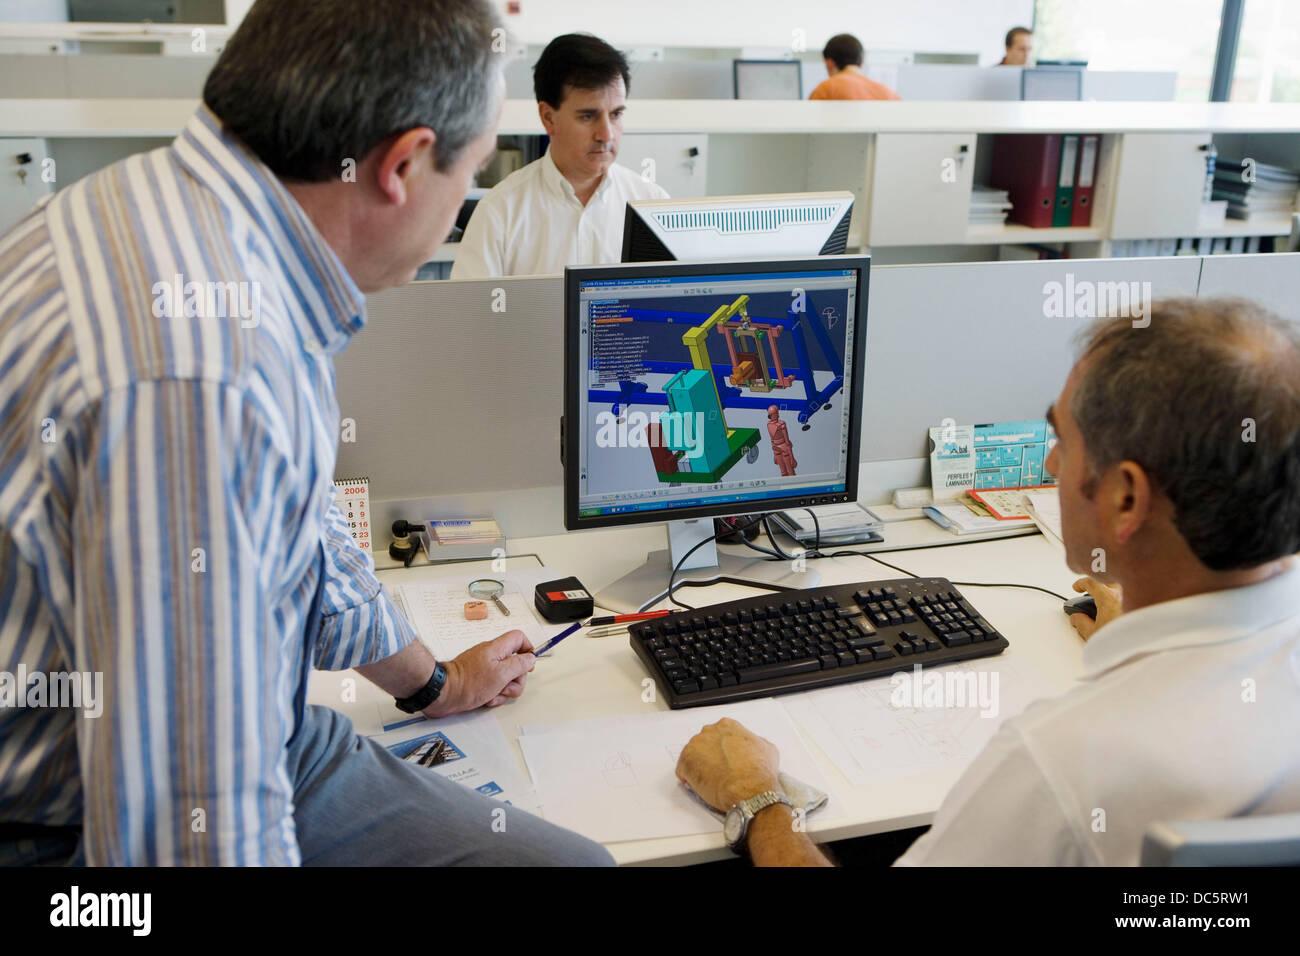 Designers working with  PCs. Cad Cam. Fatronik Foundation, Research Technology Center. Donostia, San Sebastian, - Stock Image